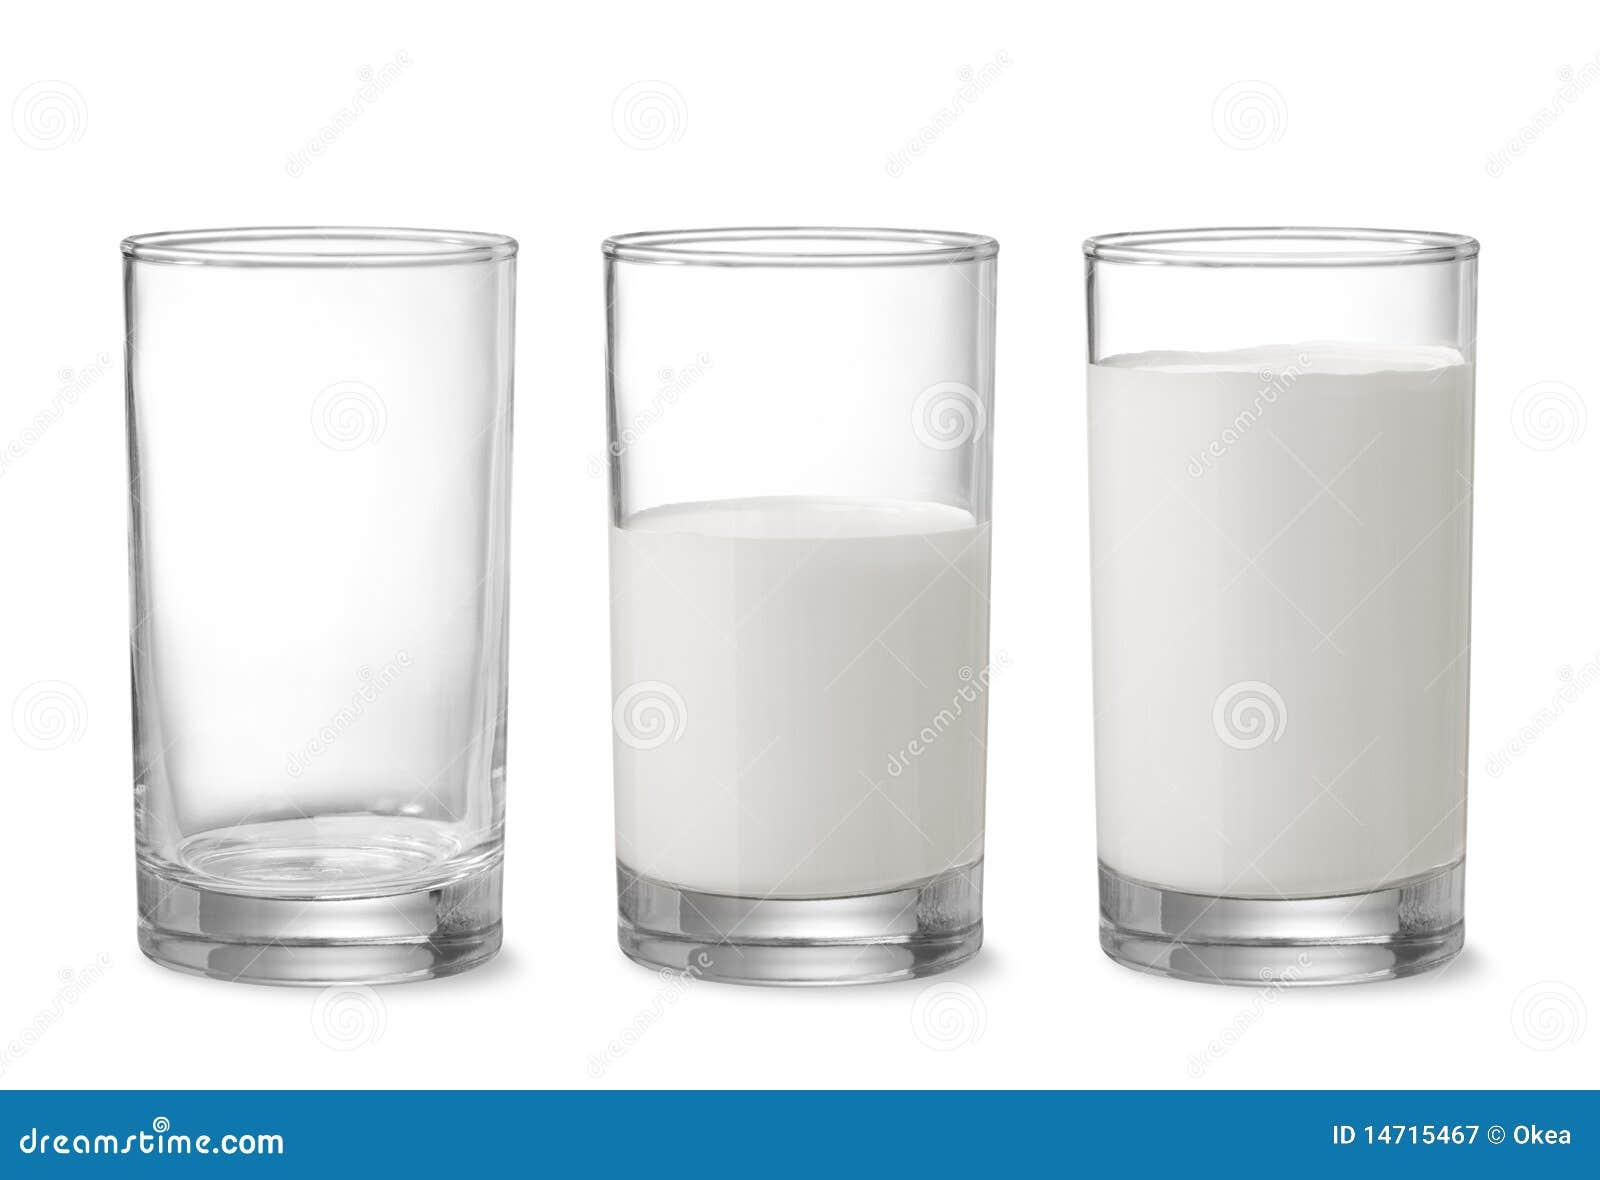 Top up the milk